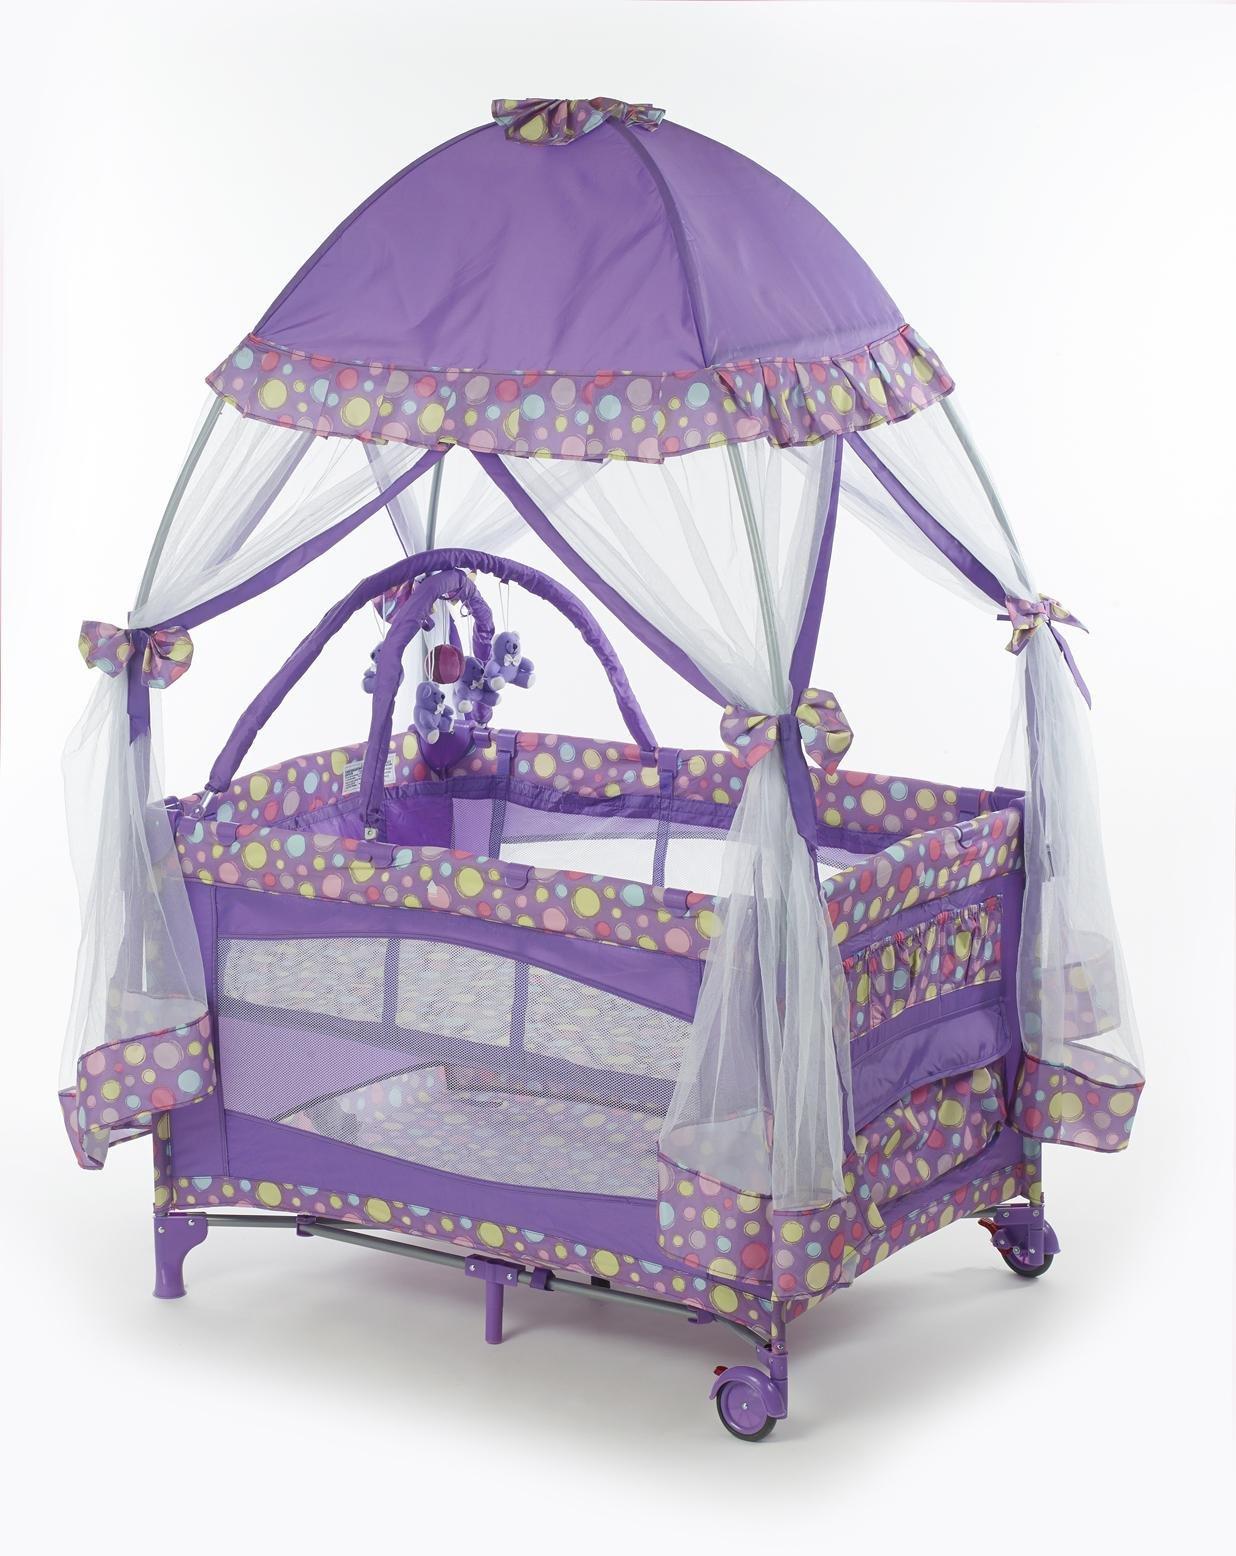 Big Oshi Playard With Mosquito Net & Cary Bag, Purple